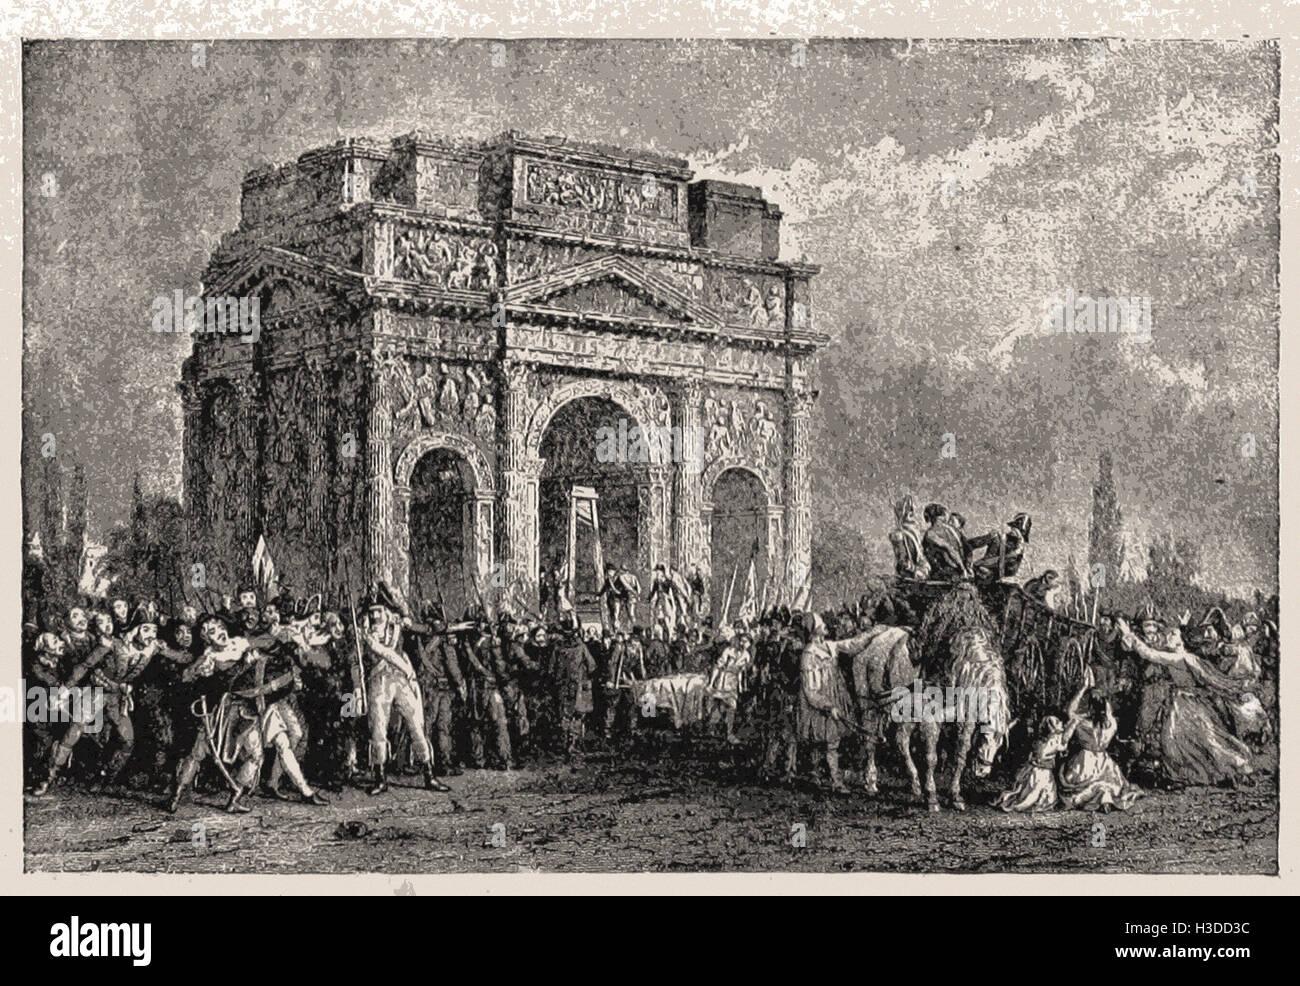 EXECUTING ROYALISTS AT ORANGE, 1793 - Stock Image